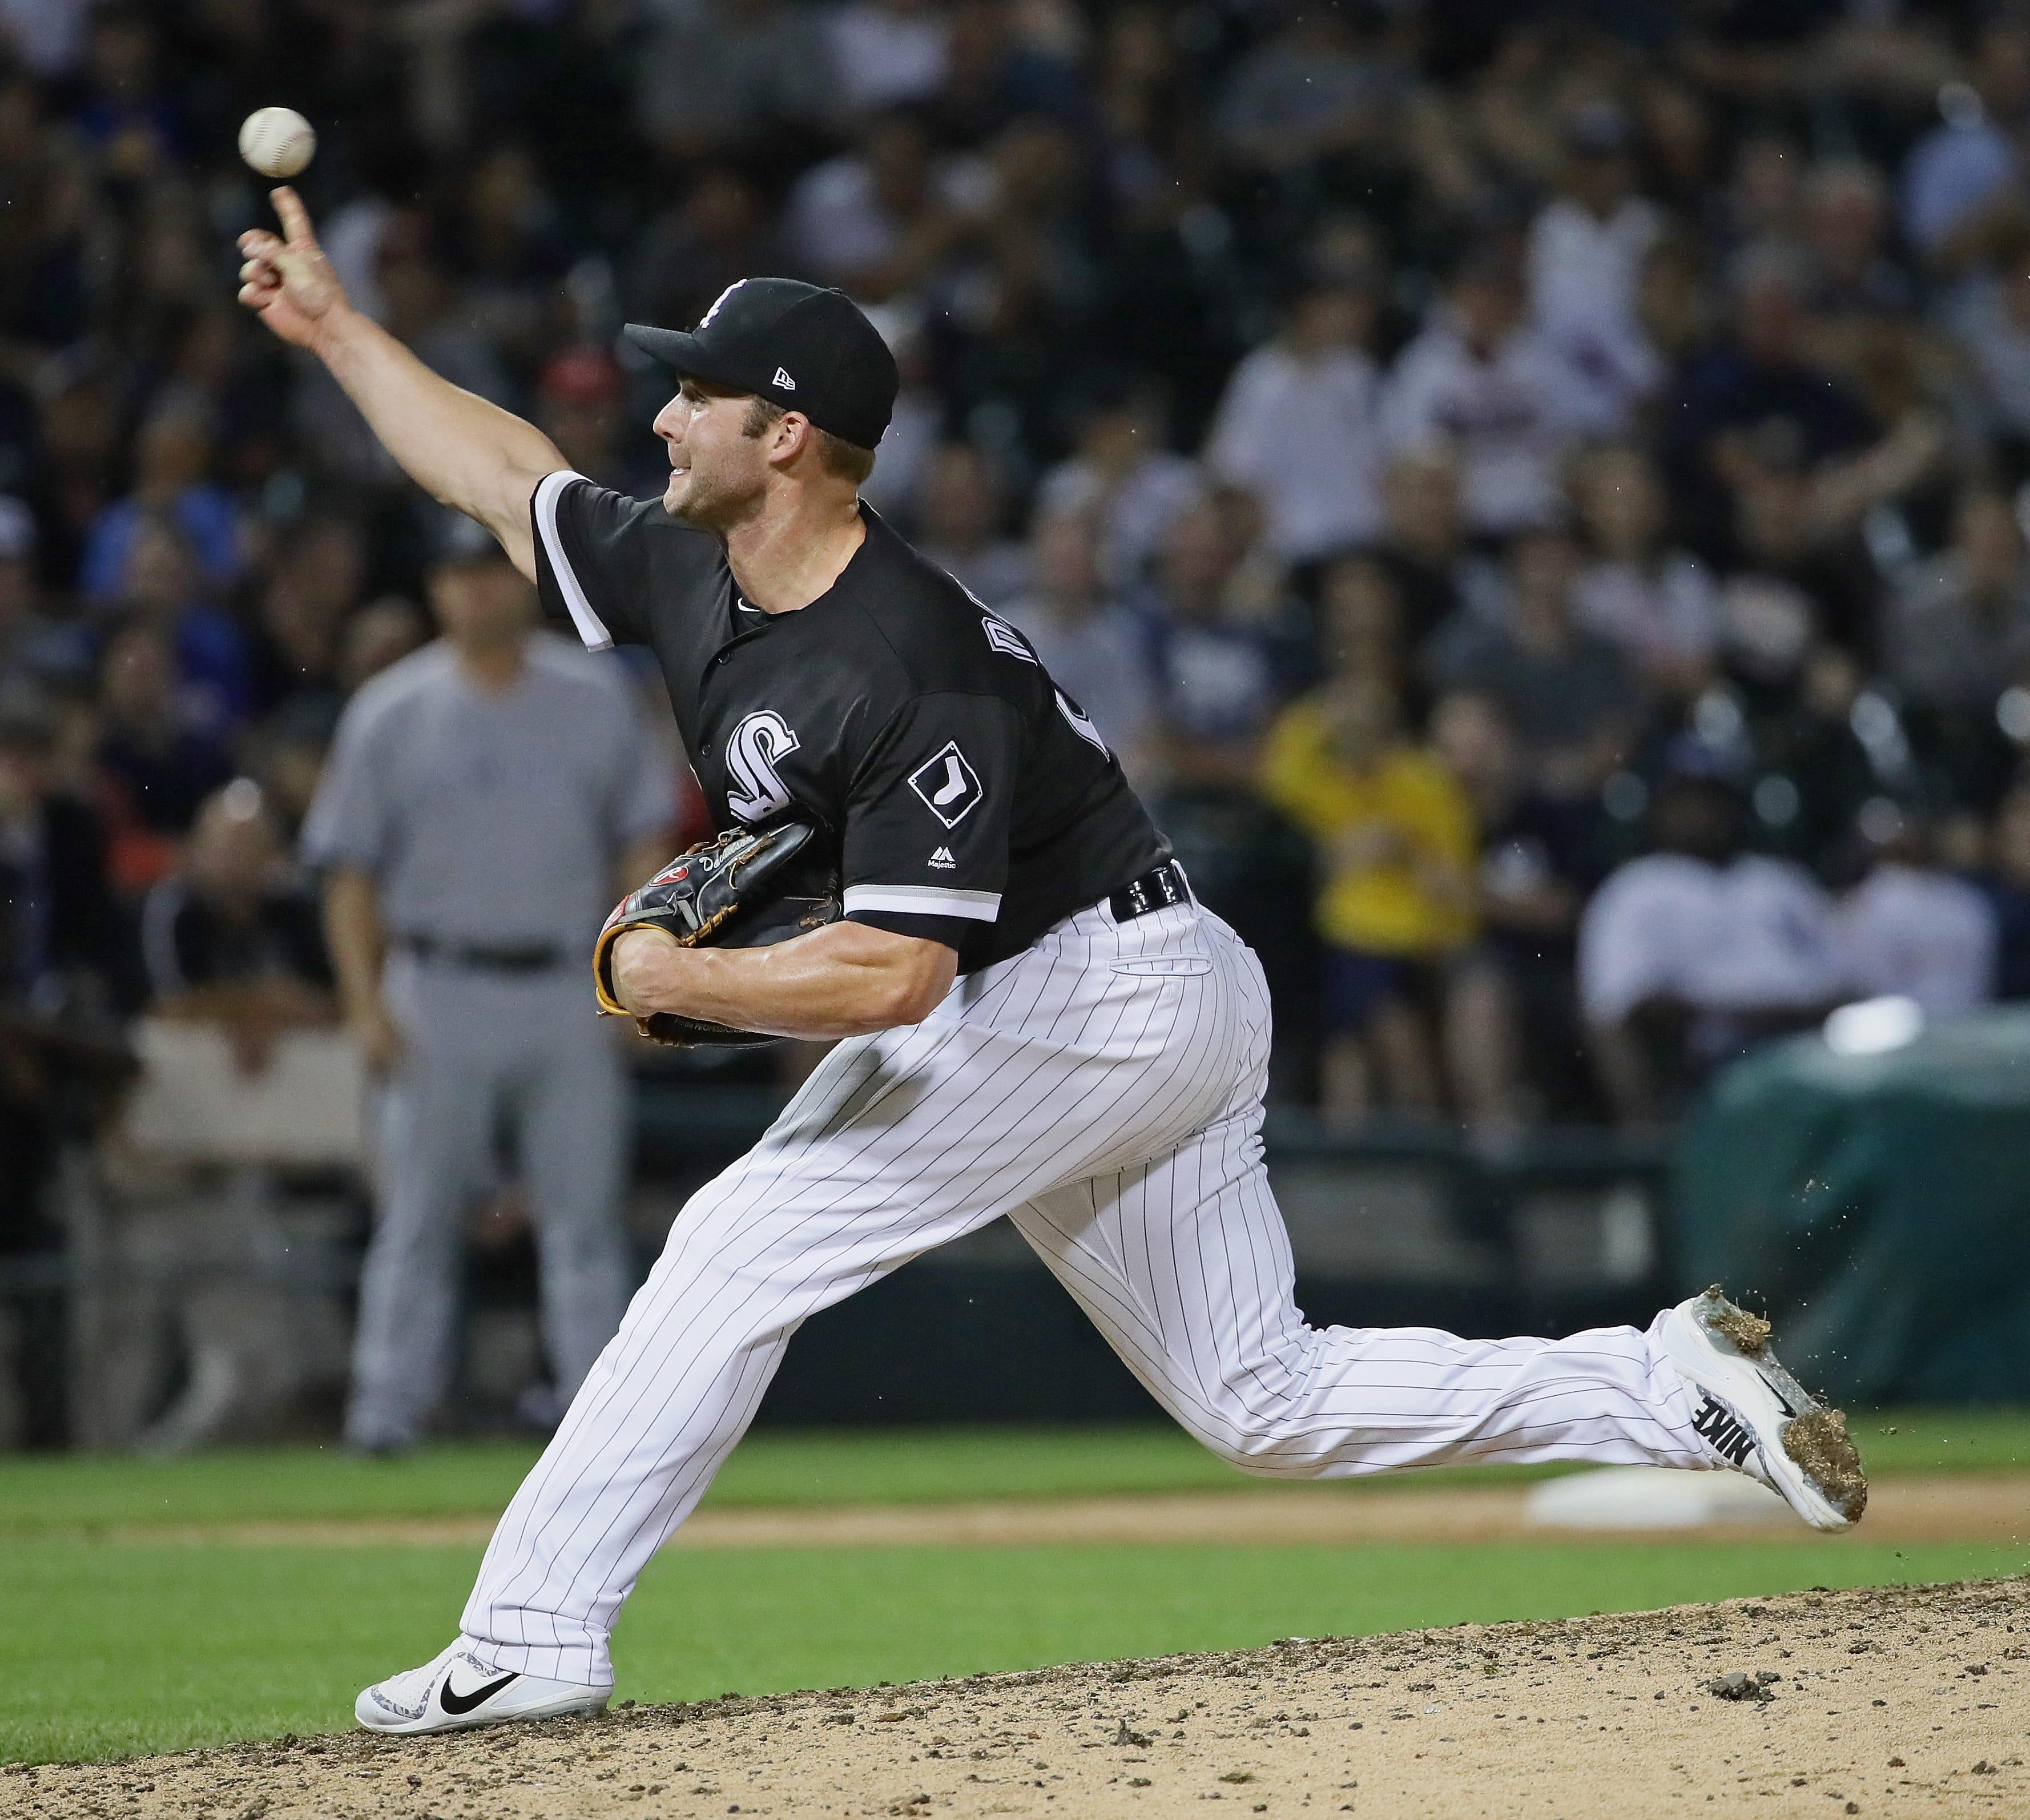 White Sox infielder Matt Davidson joins Babe Ruth with rare pitching, hitting feats